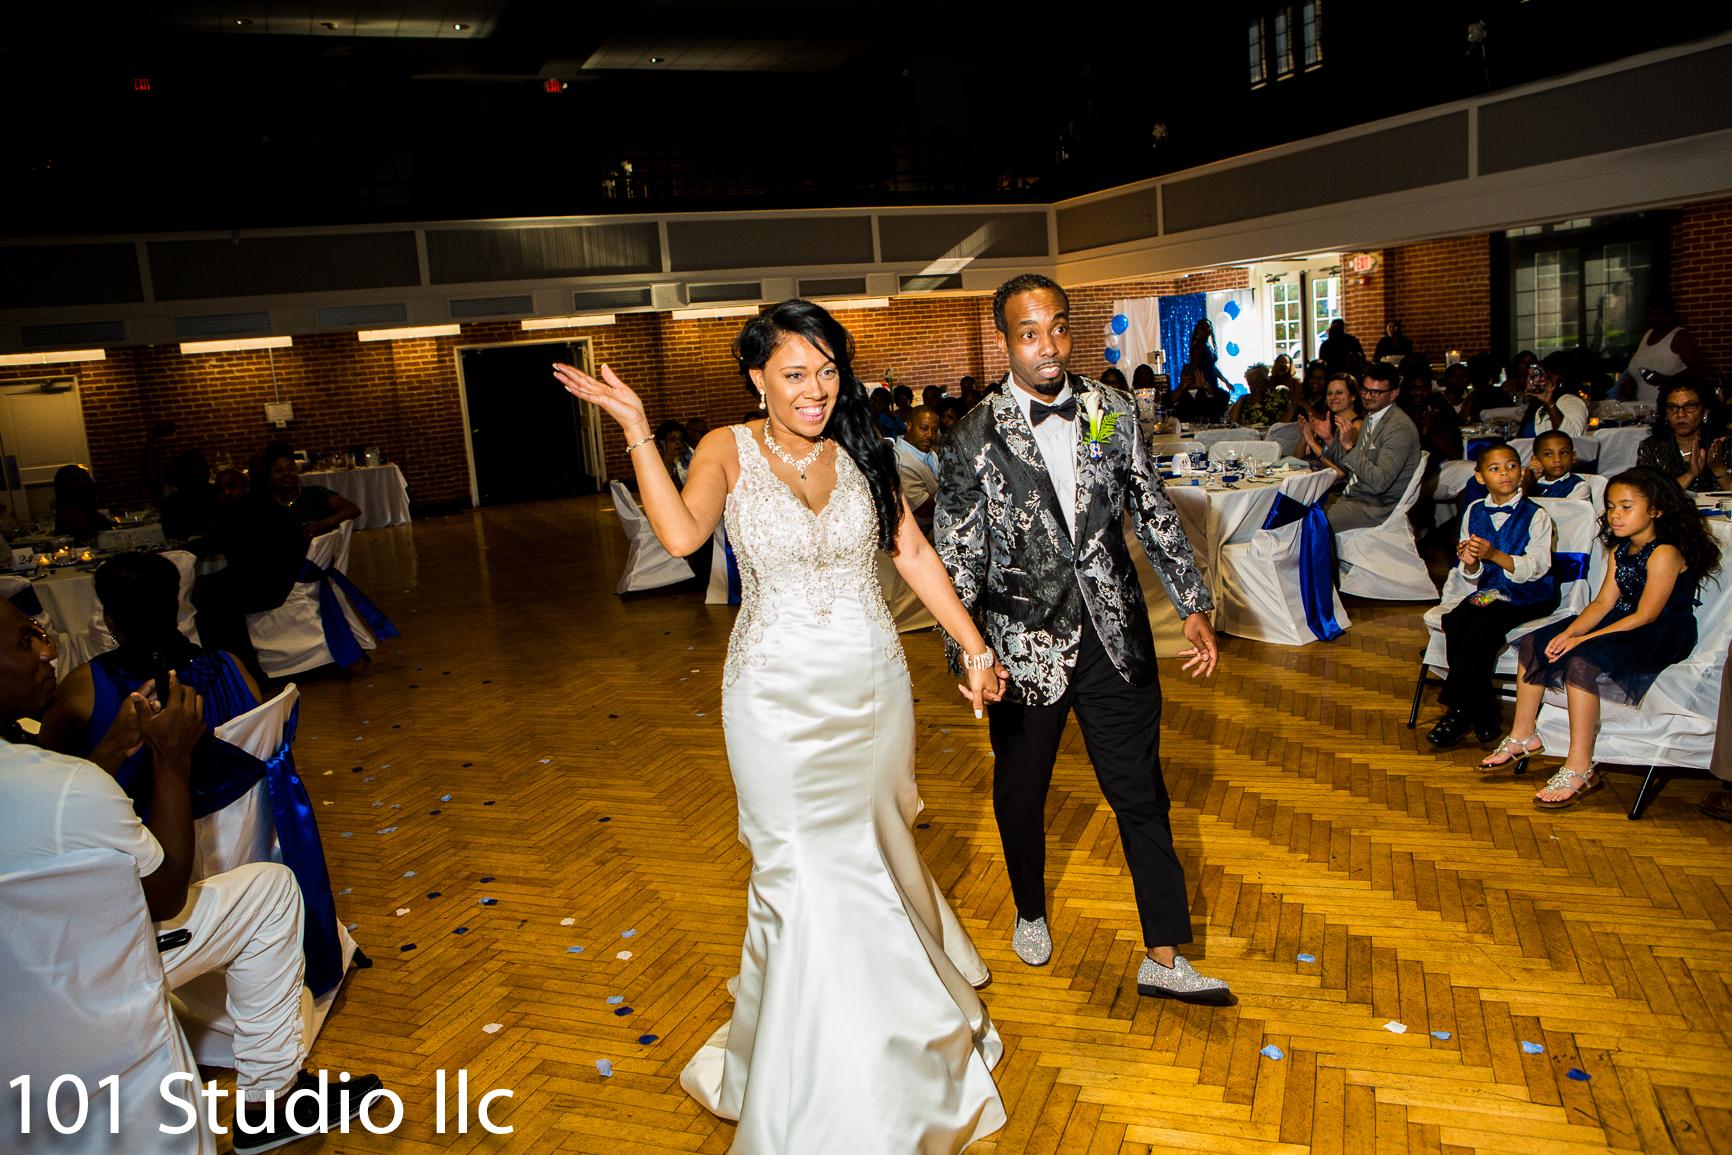 Raleigh  wedding photographer - 101 Studio llc -14.jpg